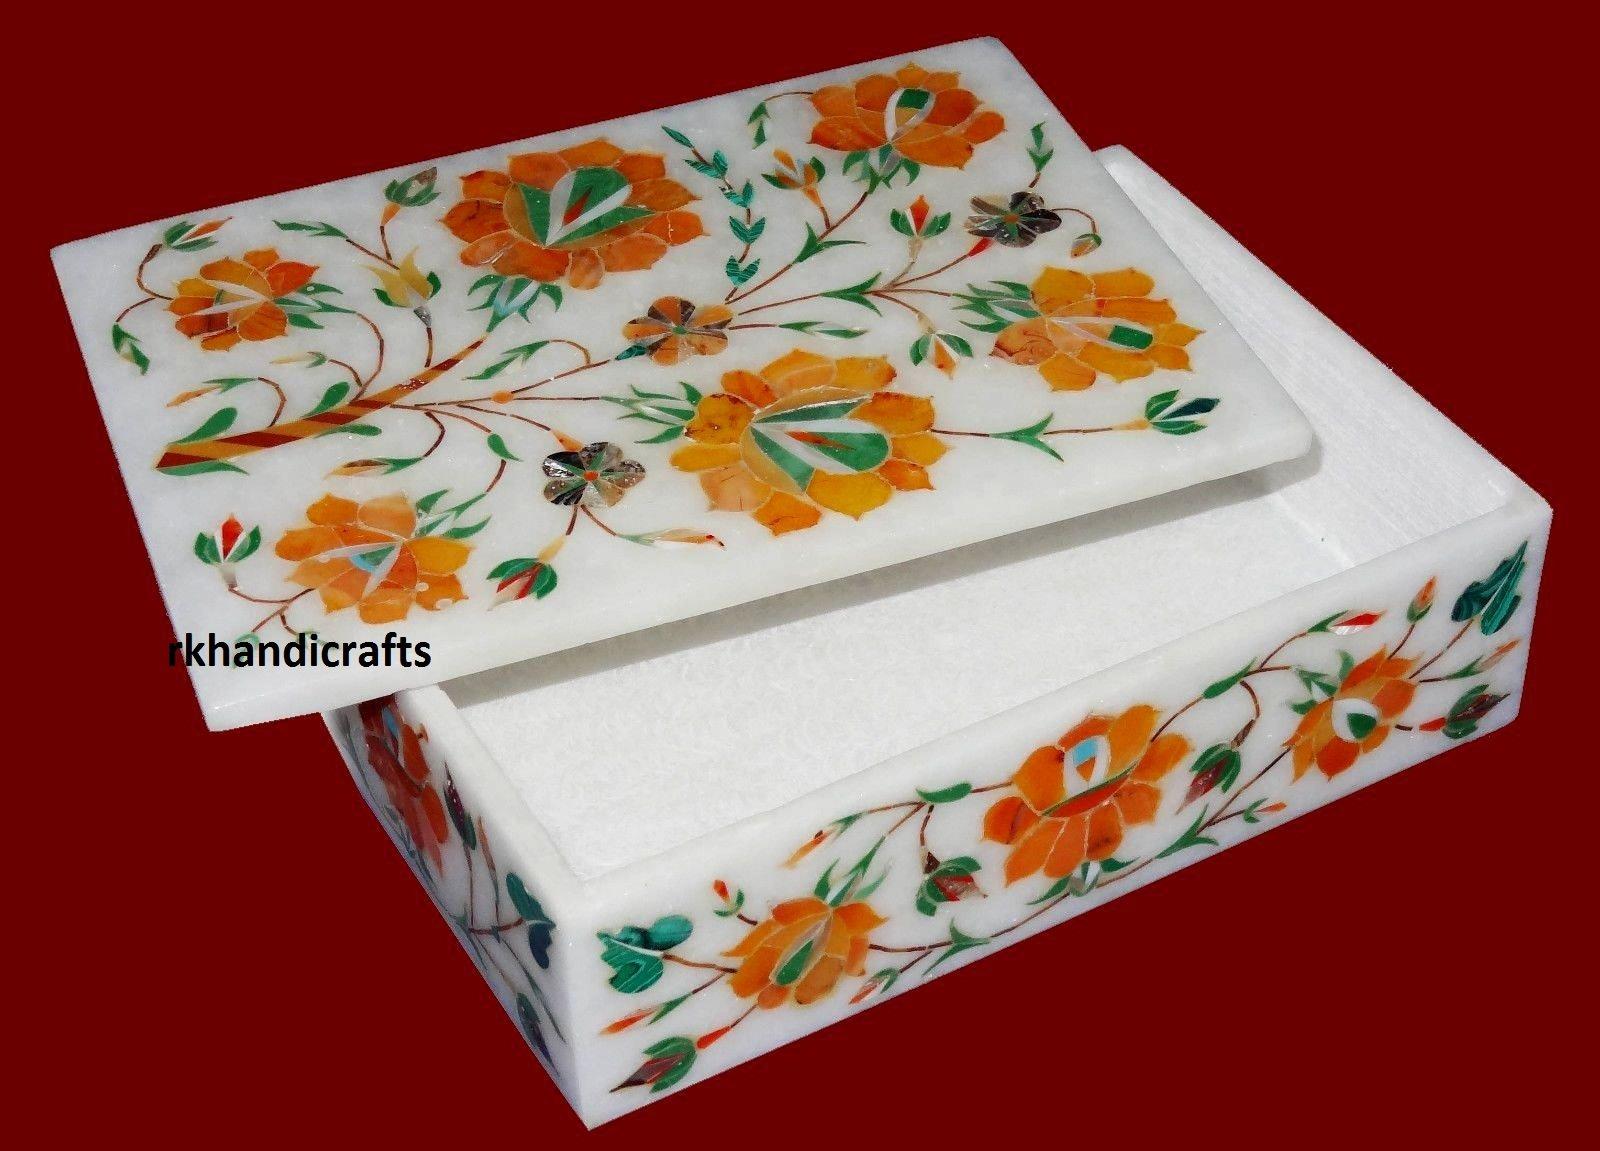 Fine Red Flower Art 7'' x 5'' x 2'' White Marble Trinket Box Cum Jewelry Box Inlay Light Multi Stones by rkhandicrafts (Image #1)